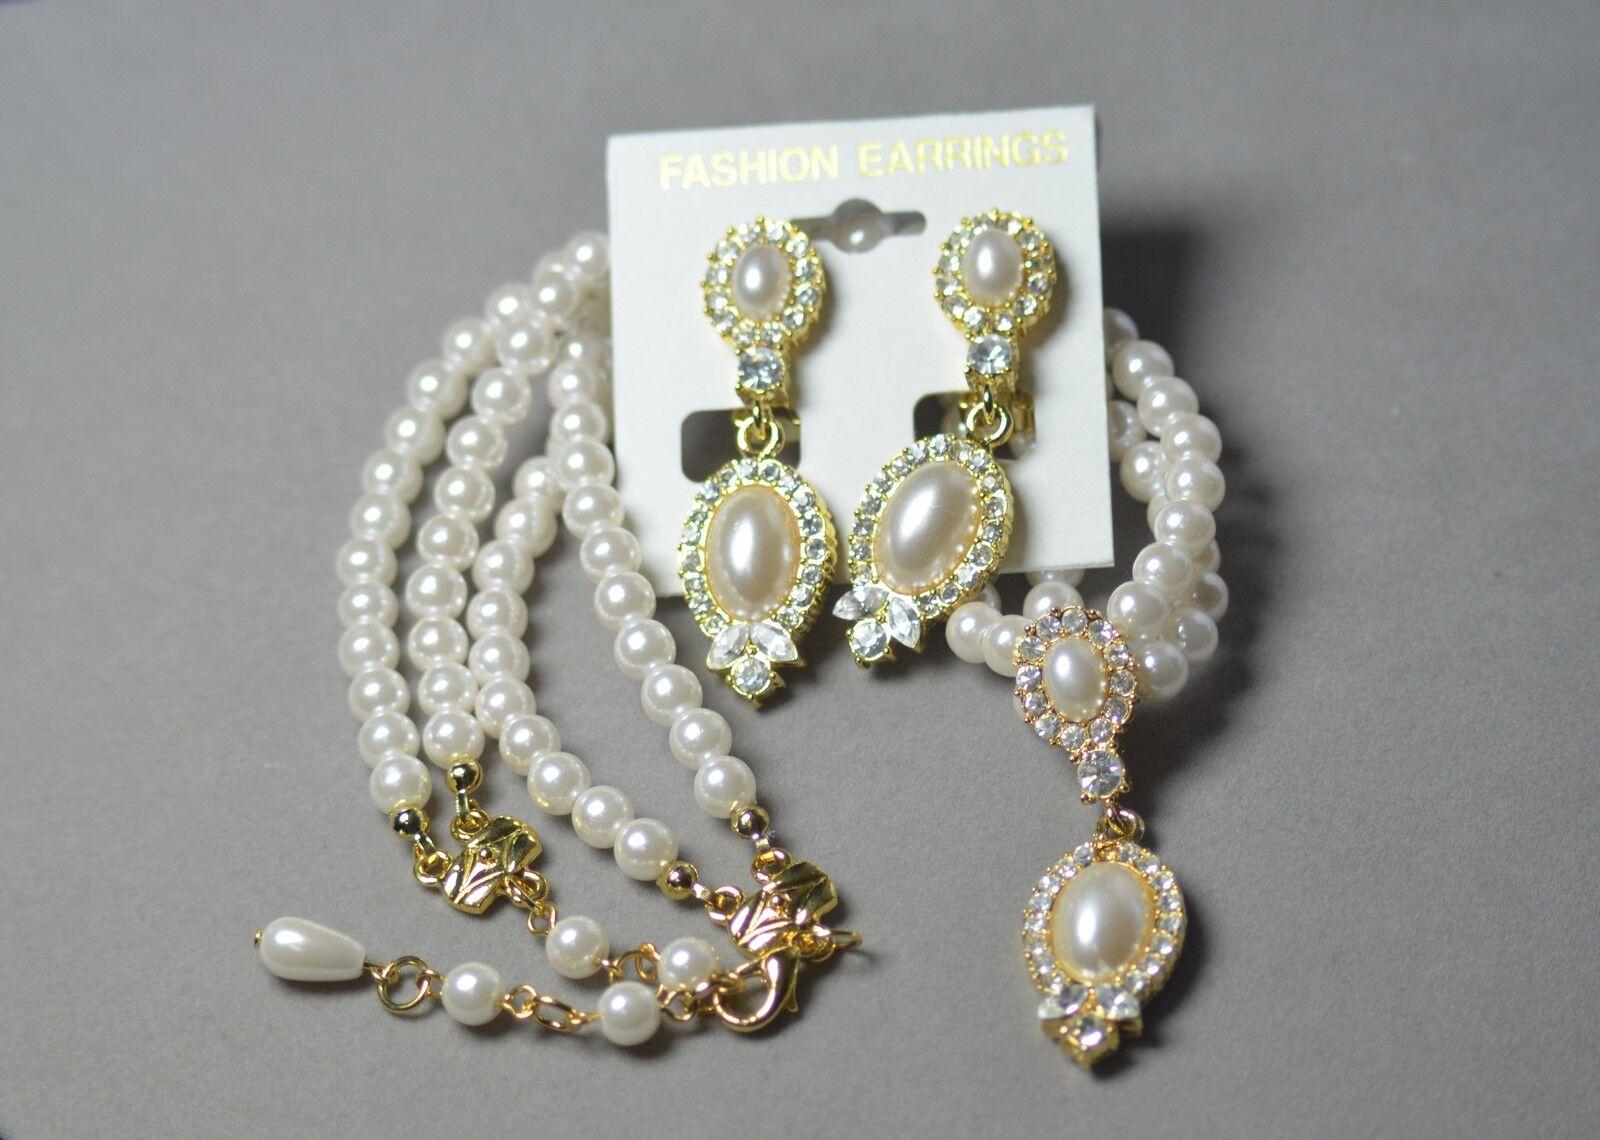 Linda's Cabs Jewelry and Gemstones